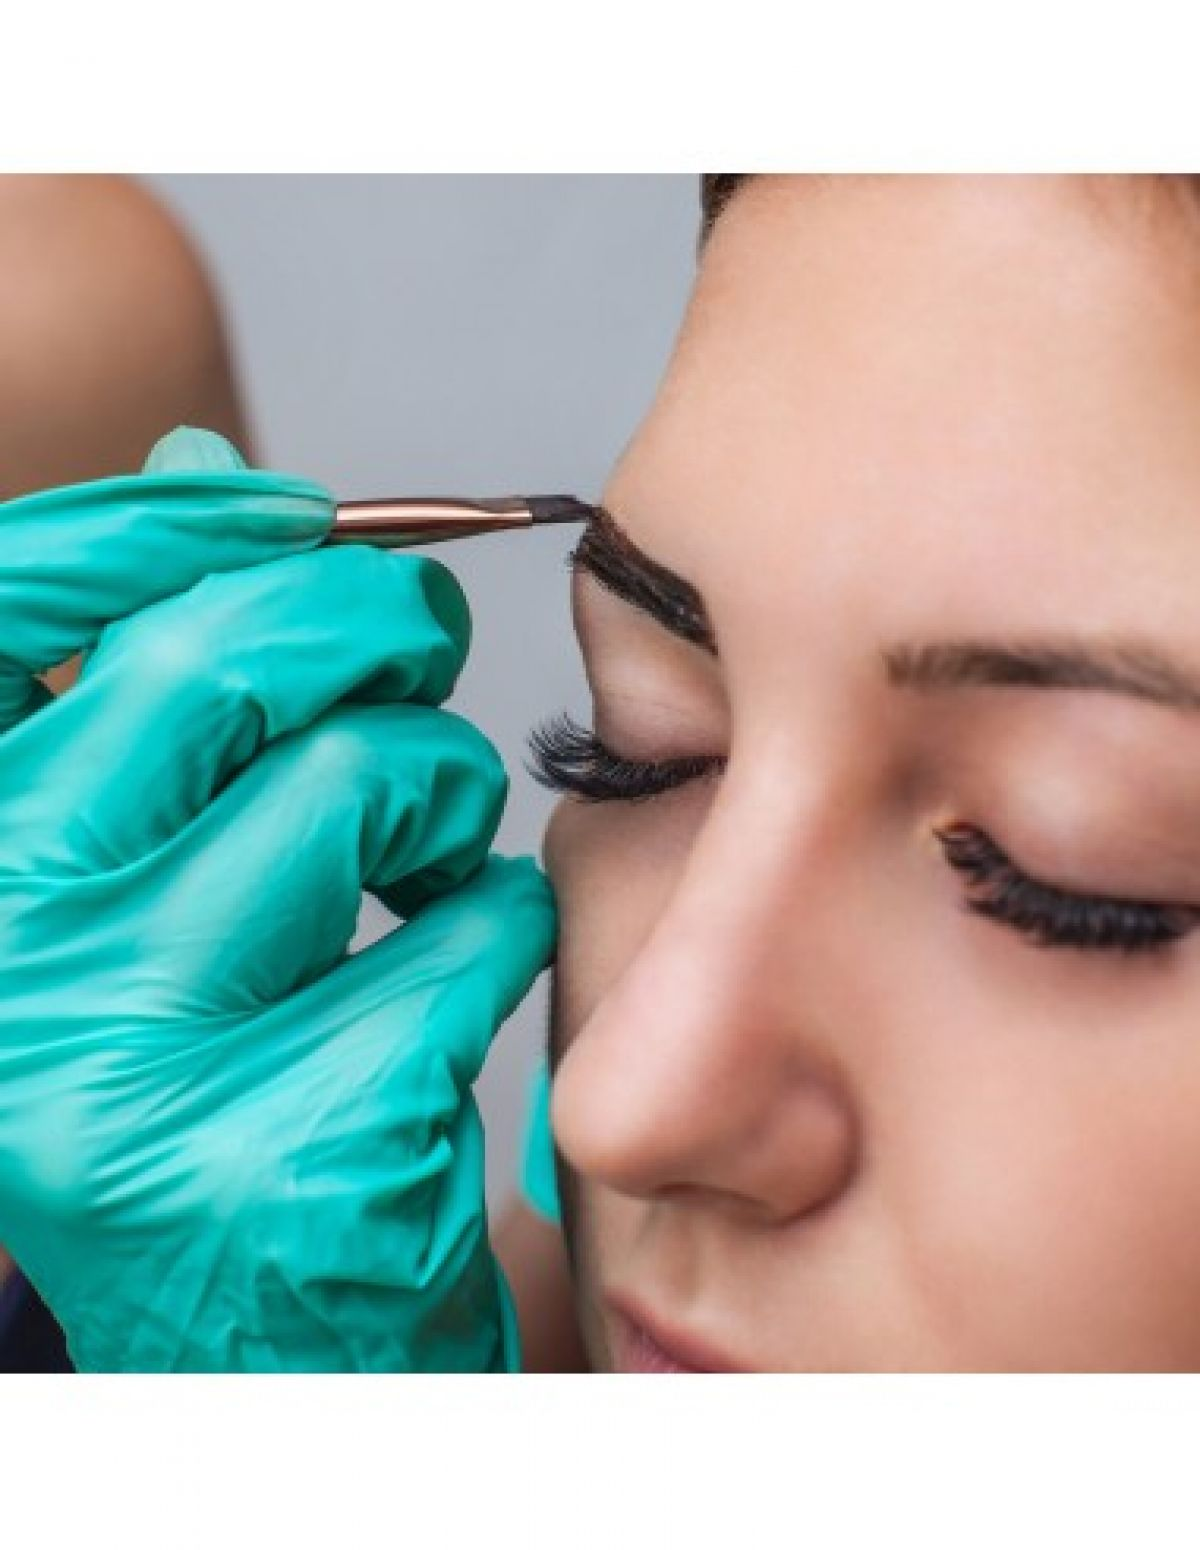 Maquillage permanent (Henna brows) à Le Havre (76) Par Ikram  - Estheca